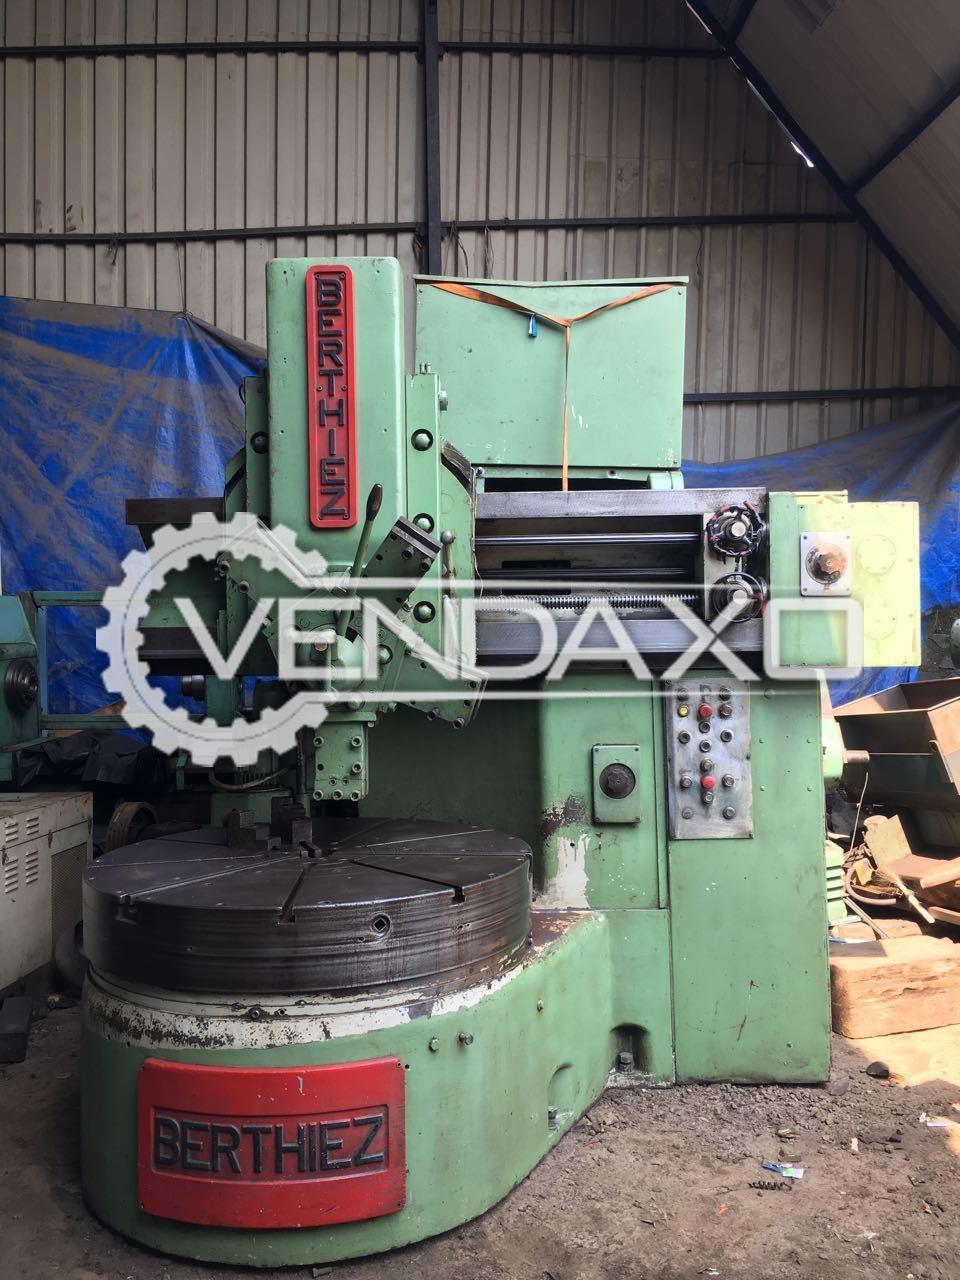 Berthiez Vertical Turret Lathe Machine